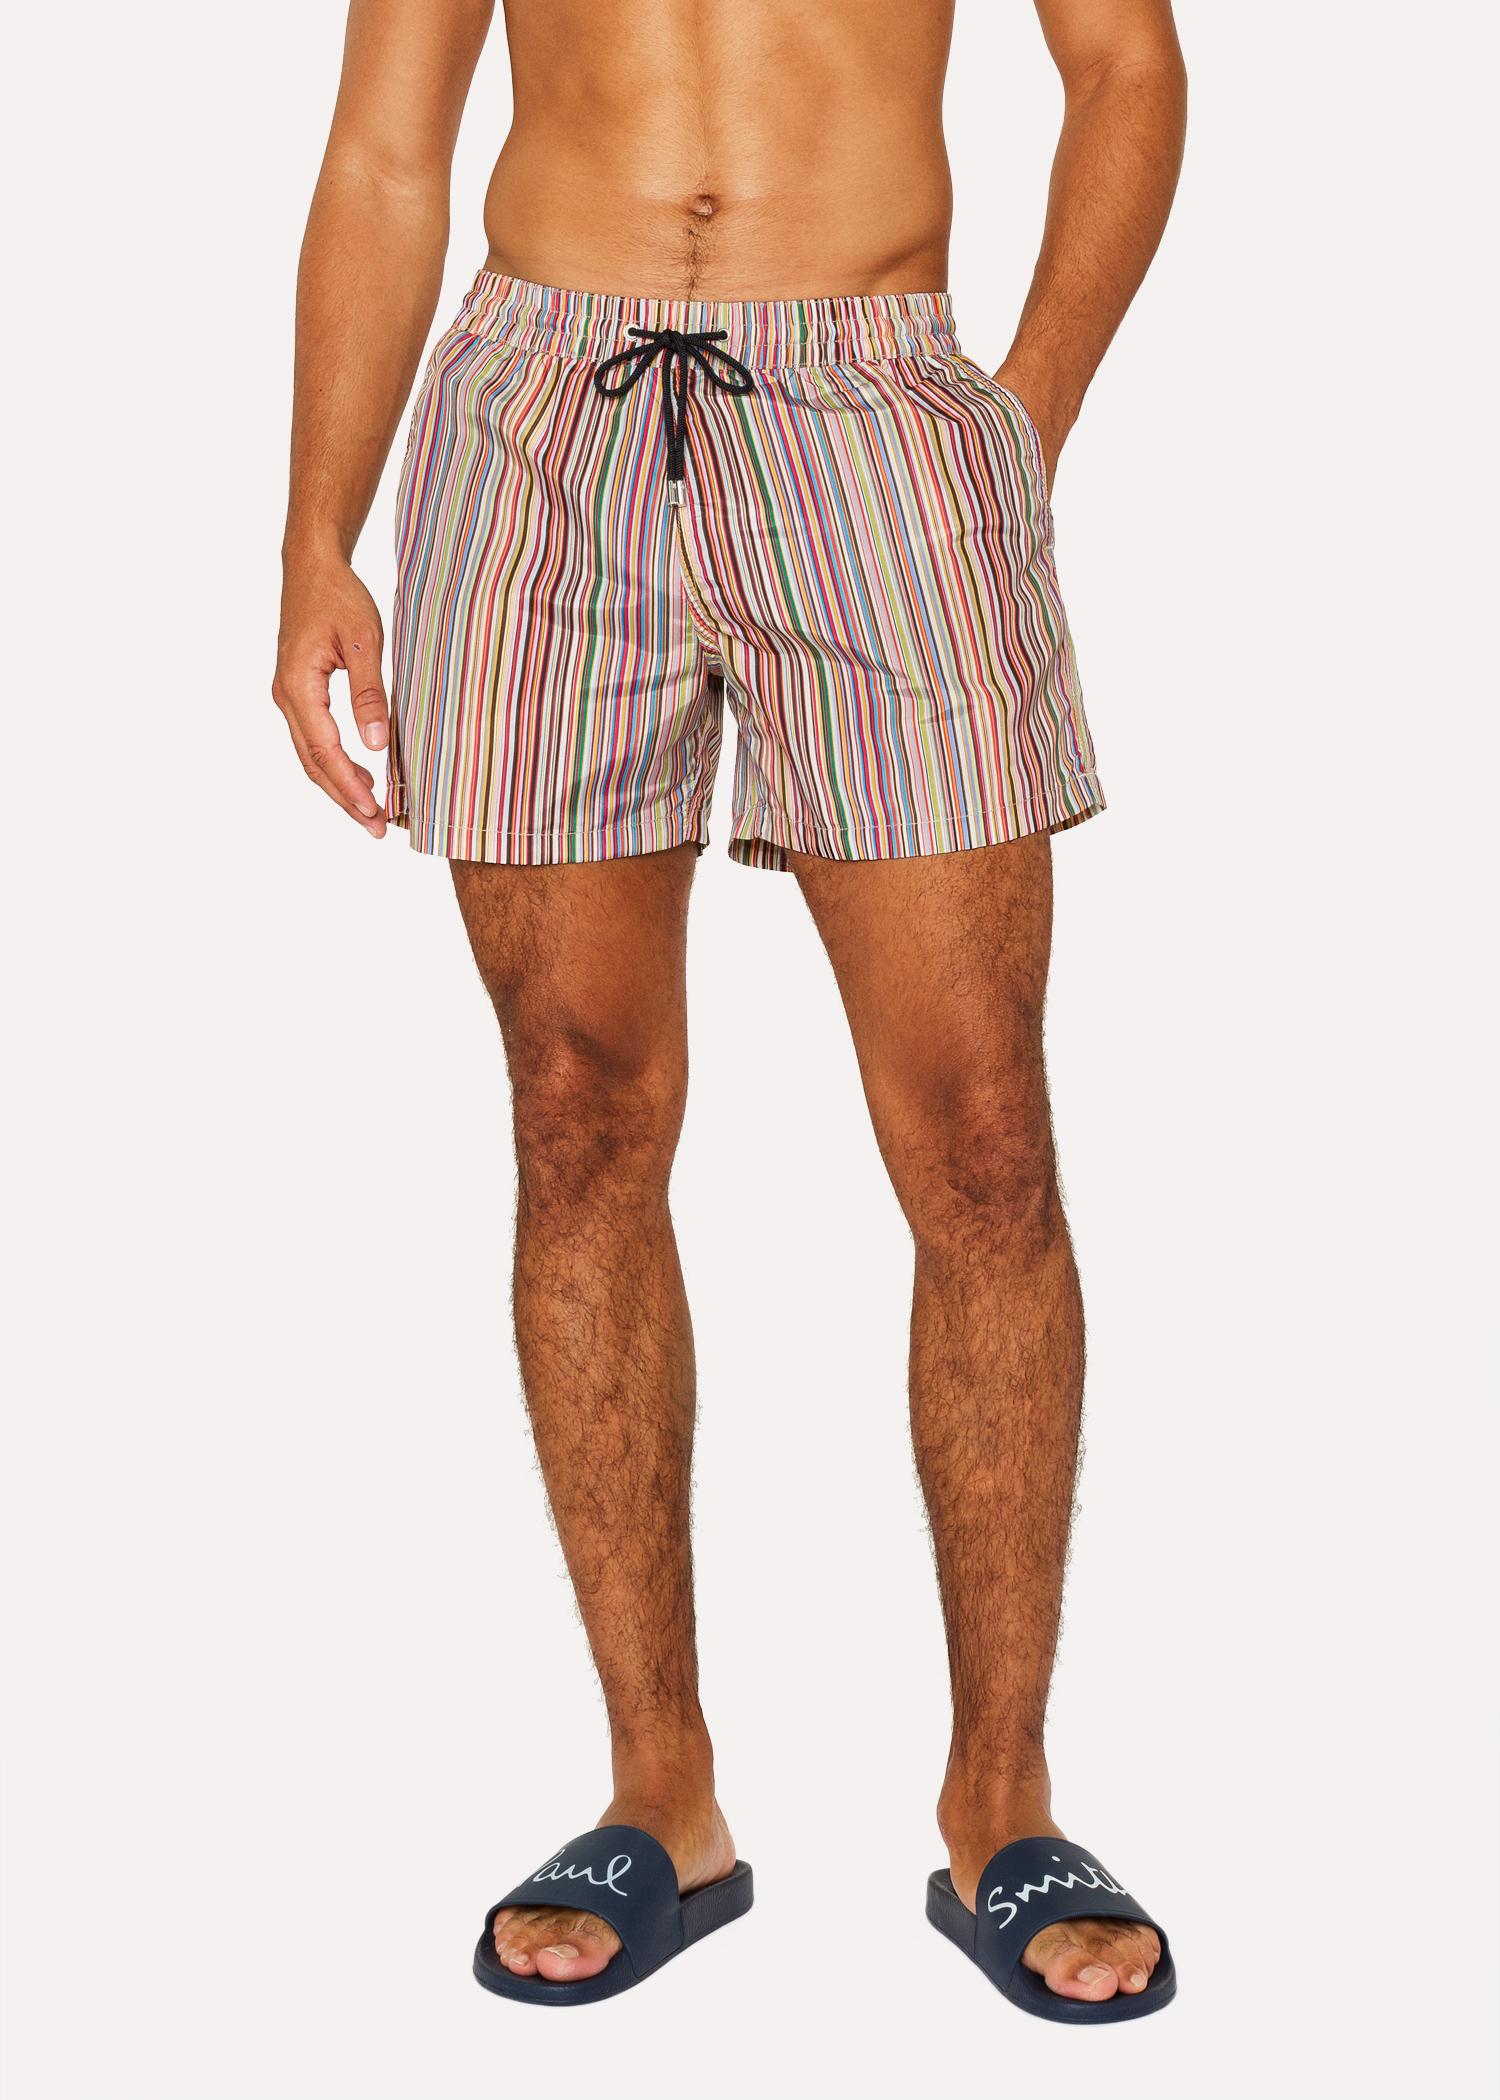 208c5c37e6 Men's 'Signature Stripe' print swim shorts by Paul Smith